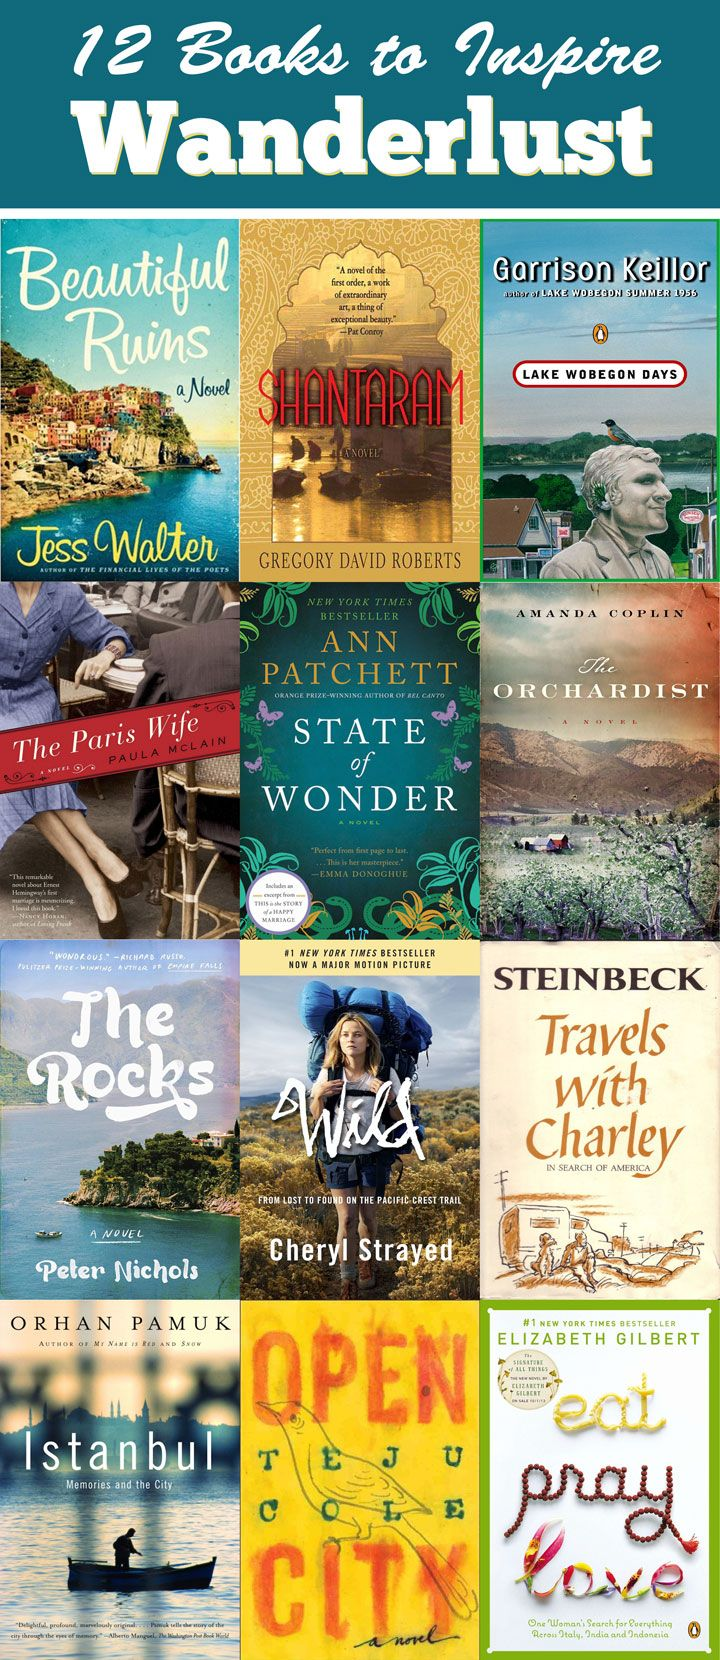 wanderlust-books